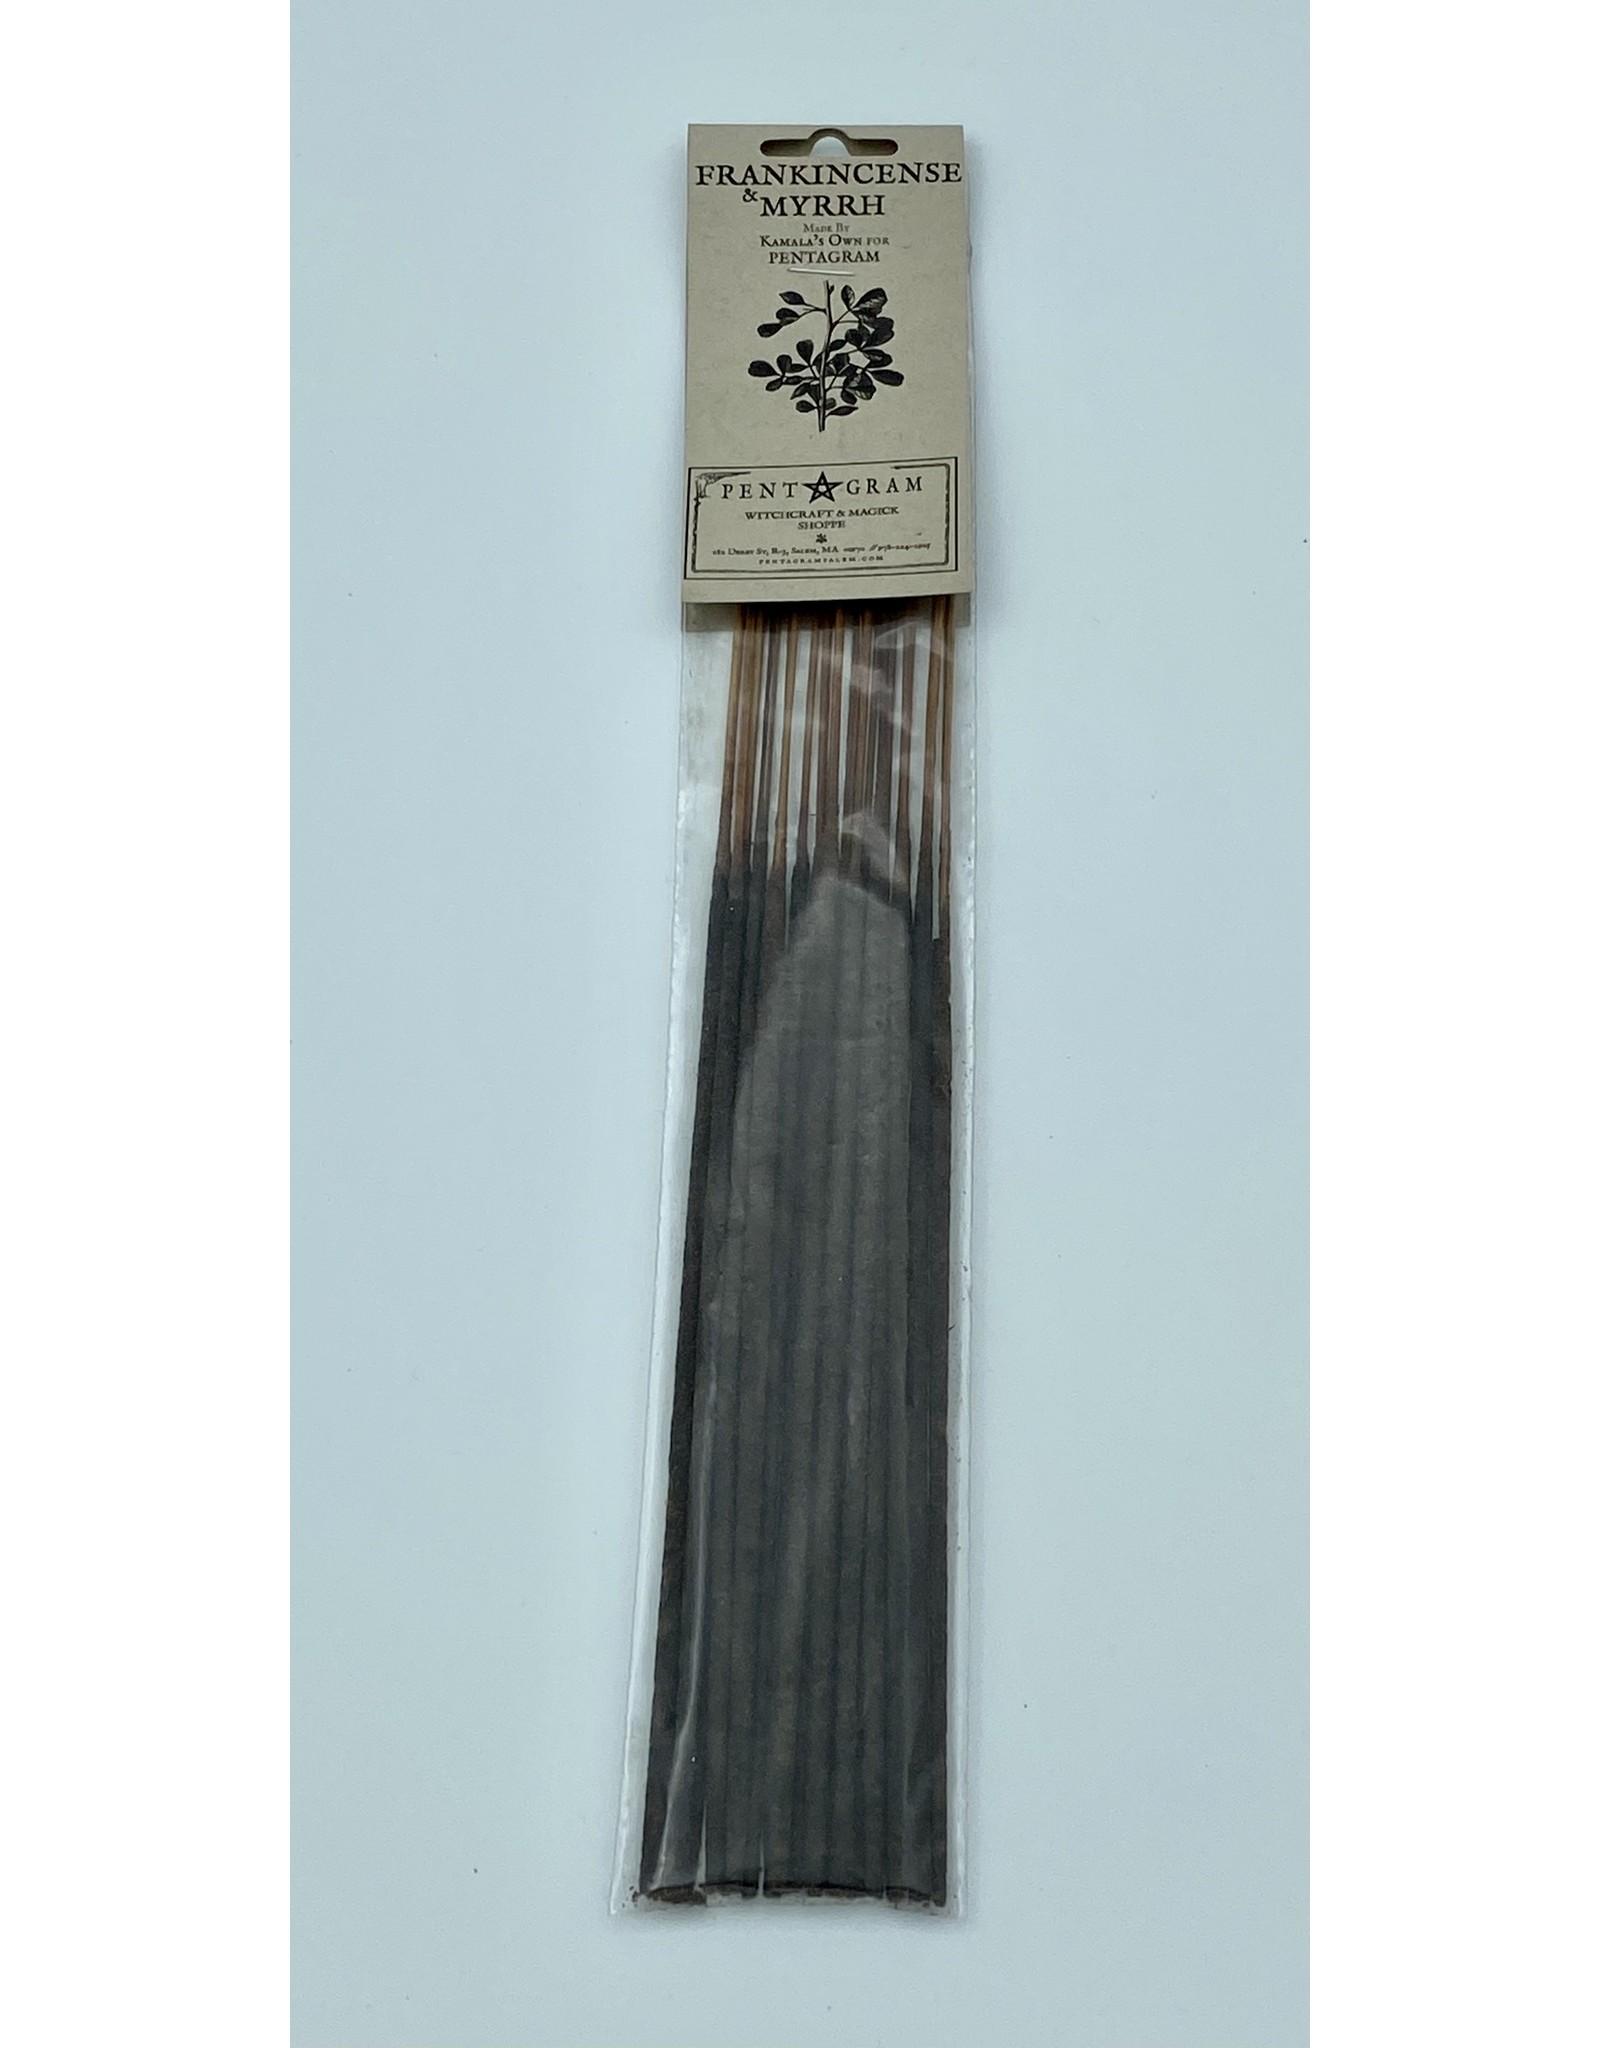 Frankincense & Myrrh Stick Incense